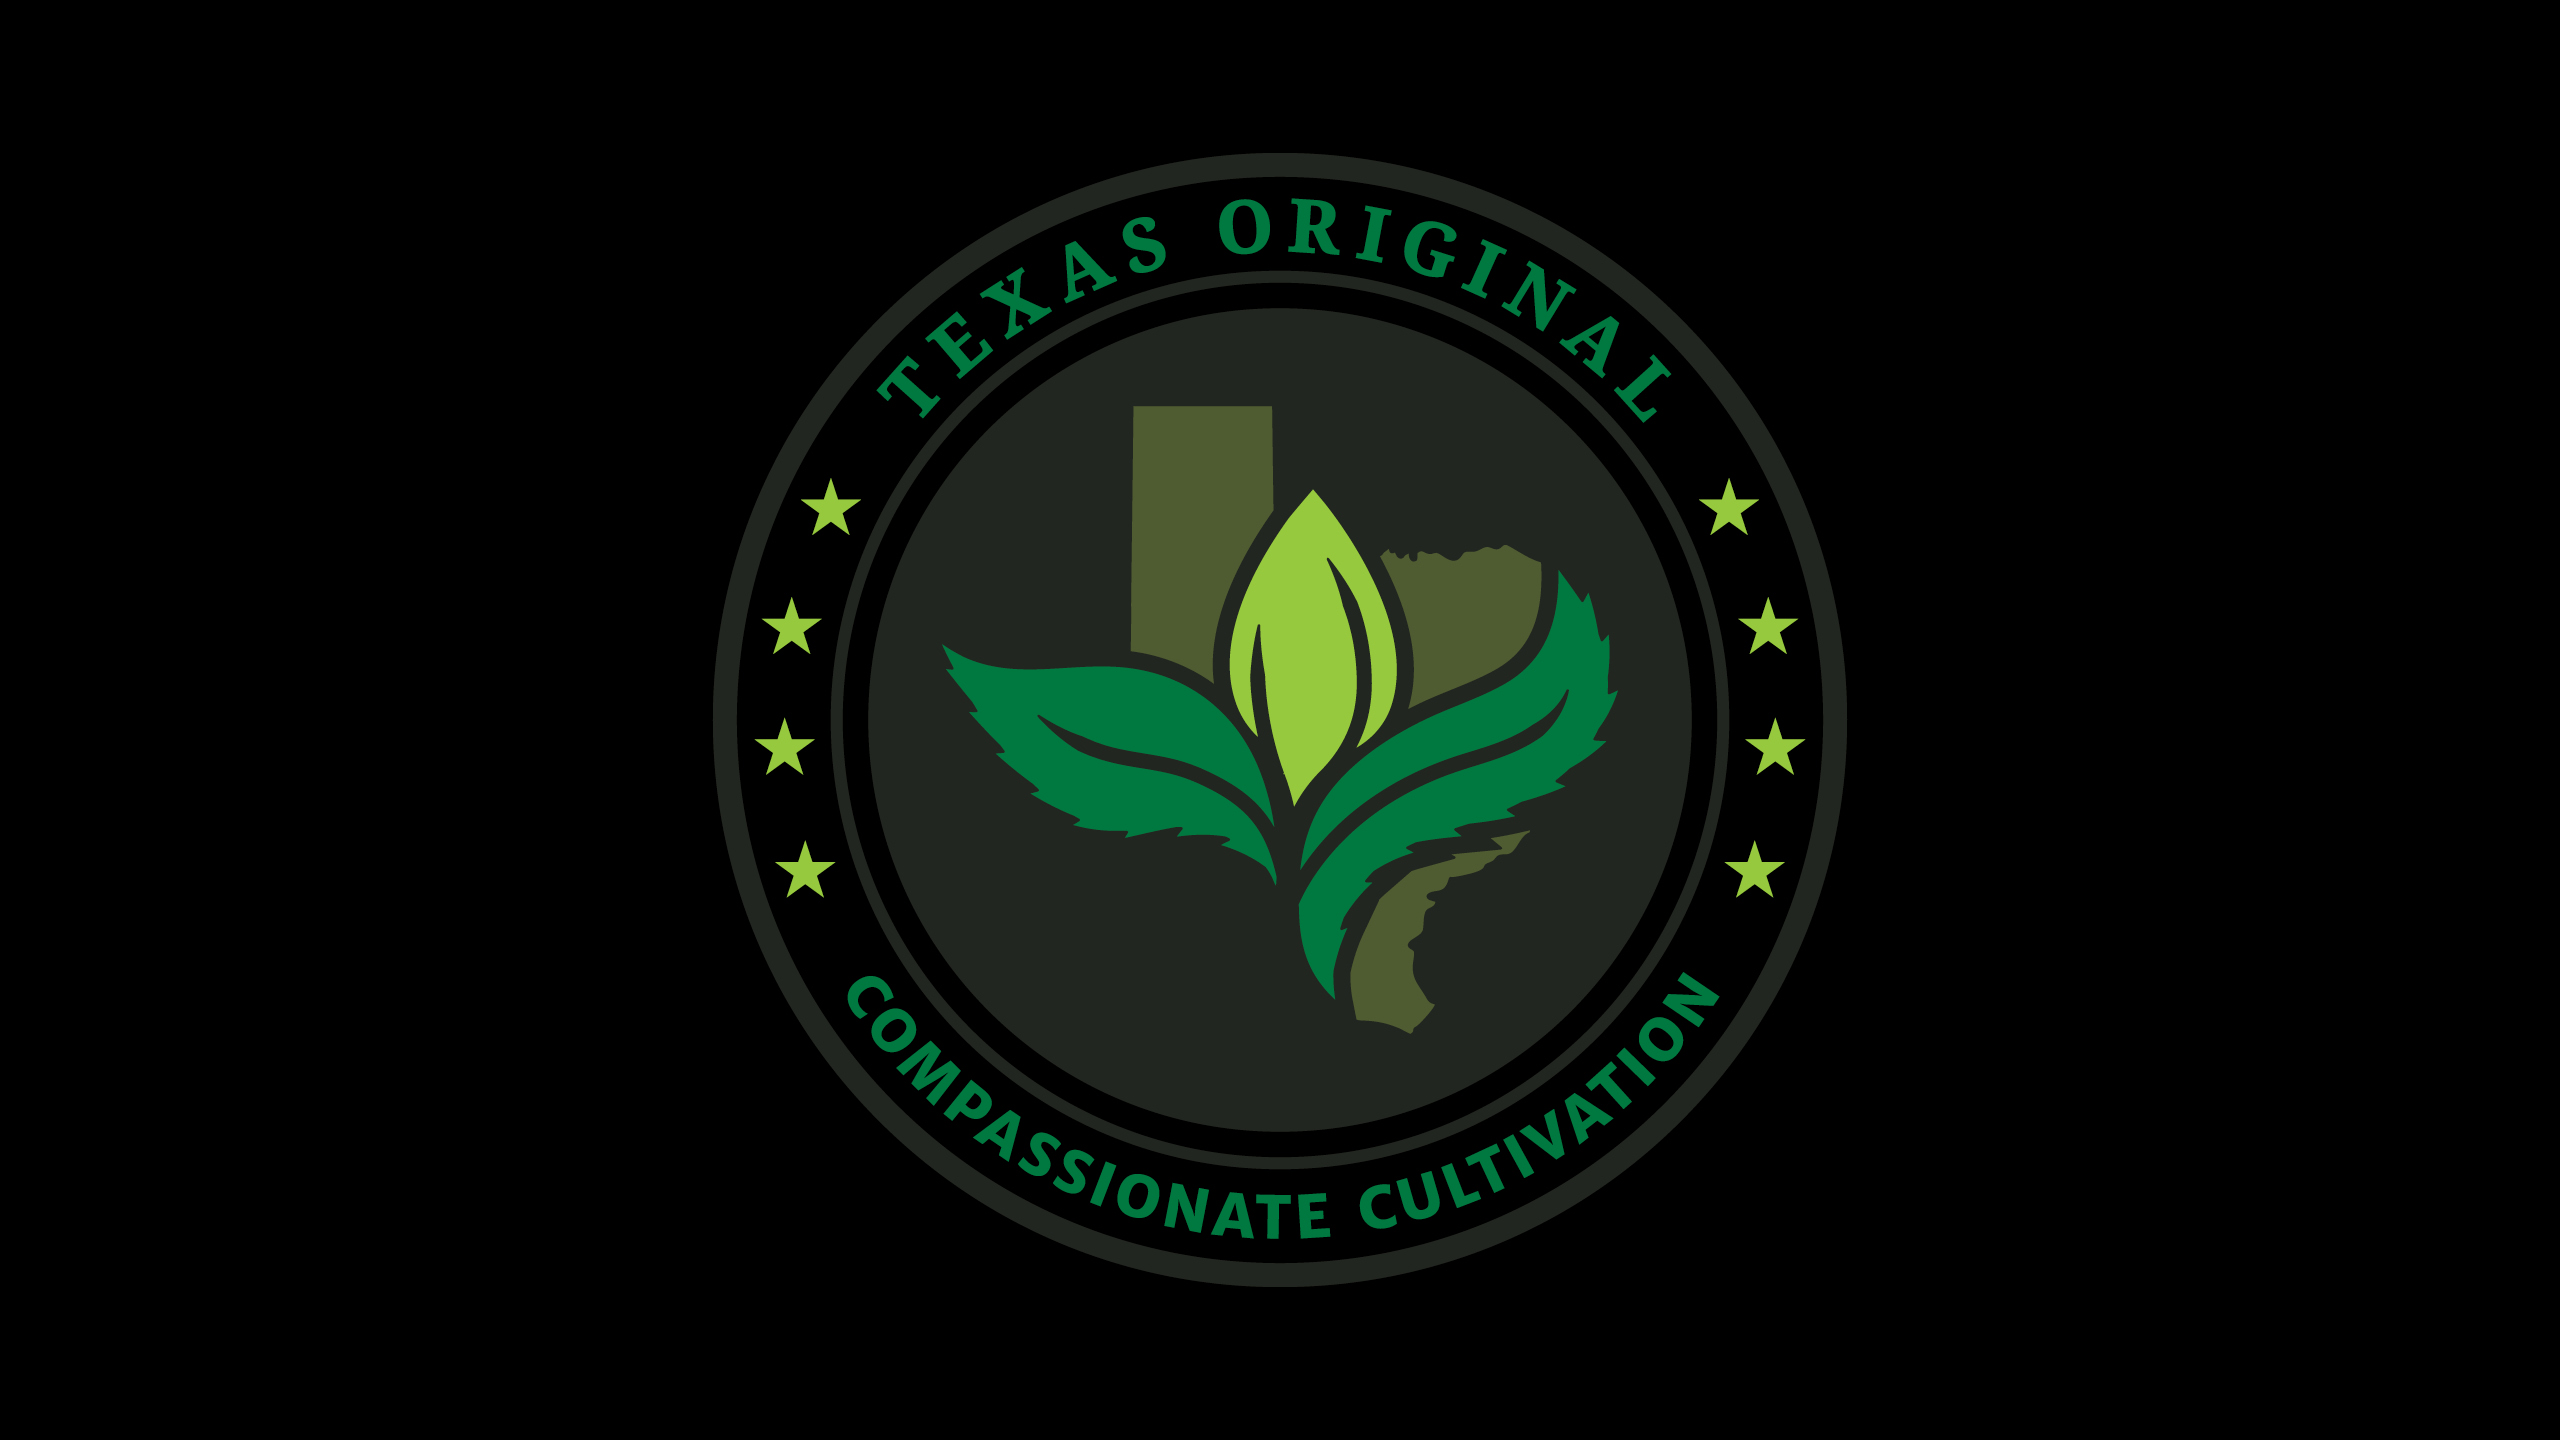 Texas Original Cannabis Company Logo Creation by High Road Studio